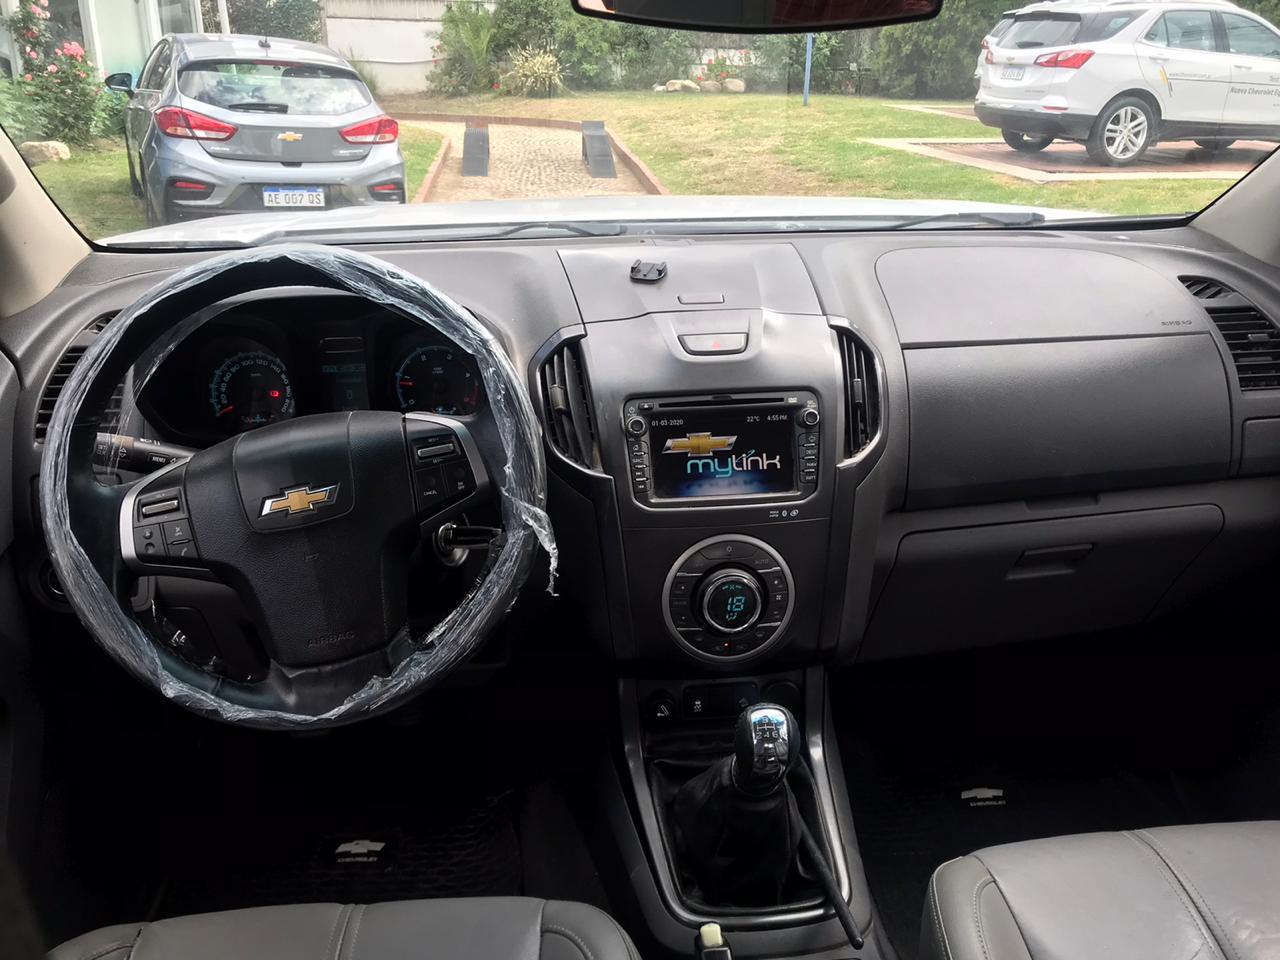 2014 CHEVROLET S10 LTZ 1,8L